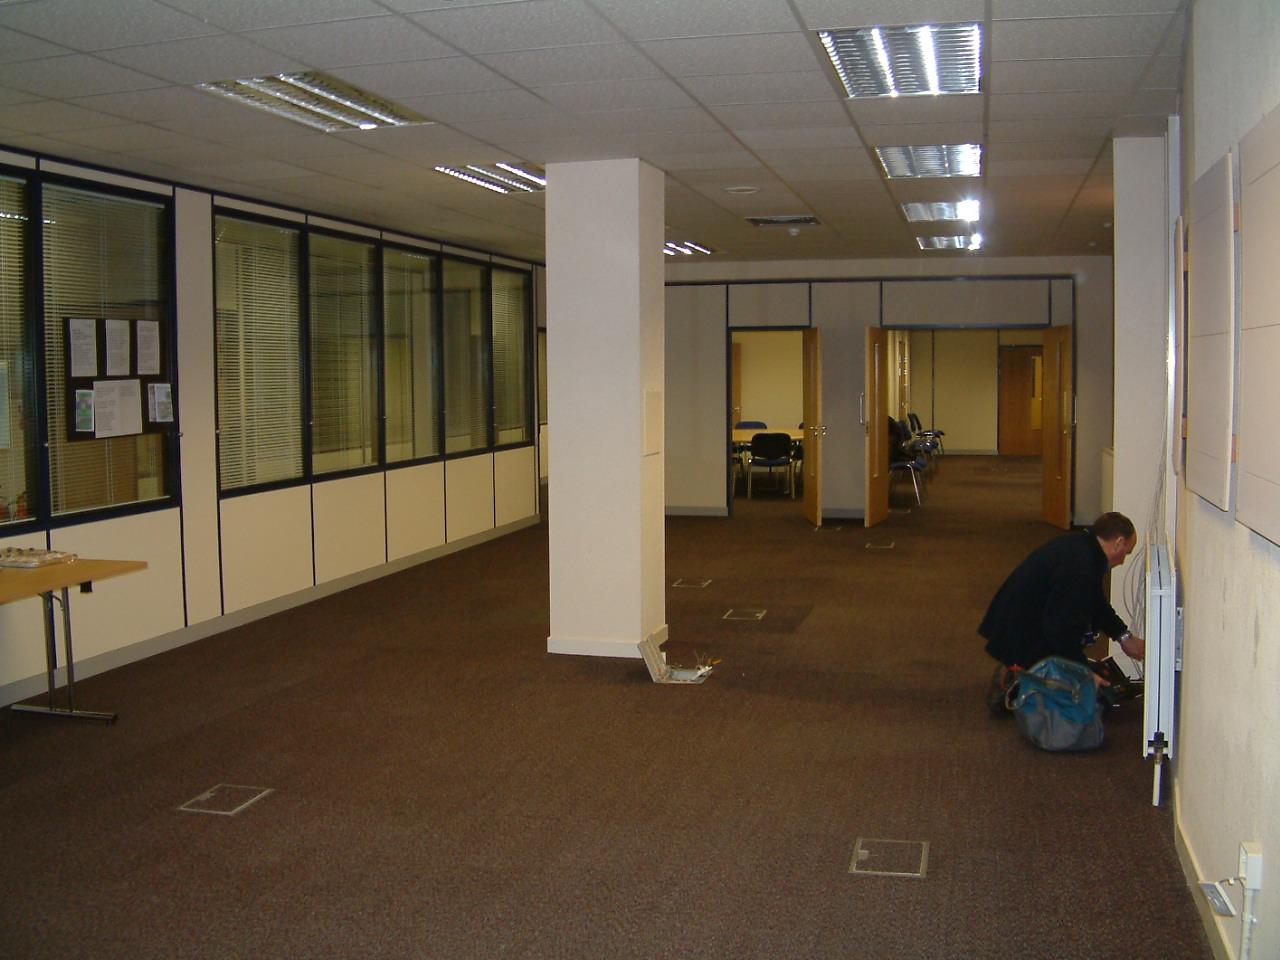 Building work Undergo